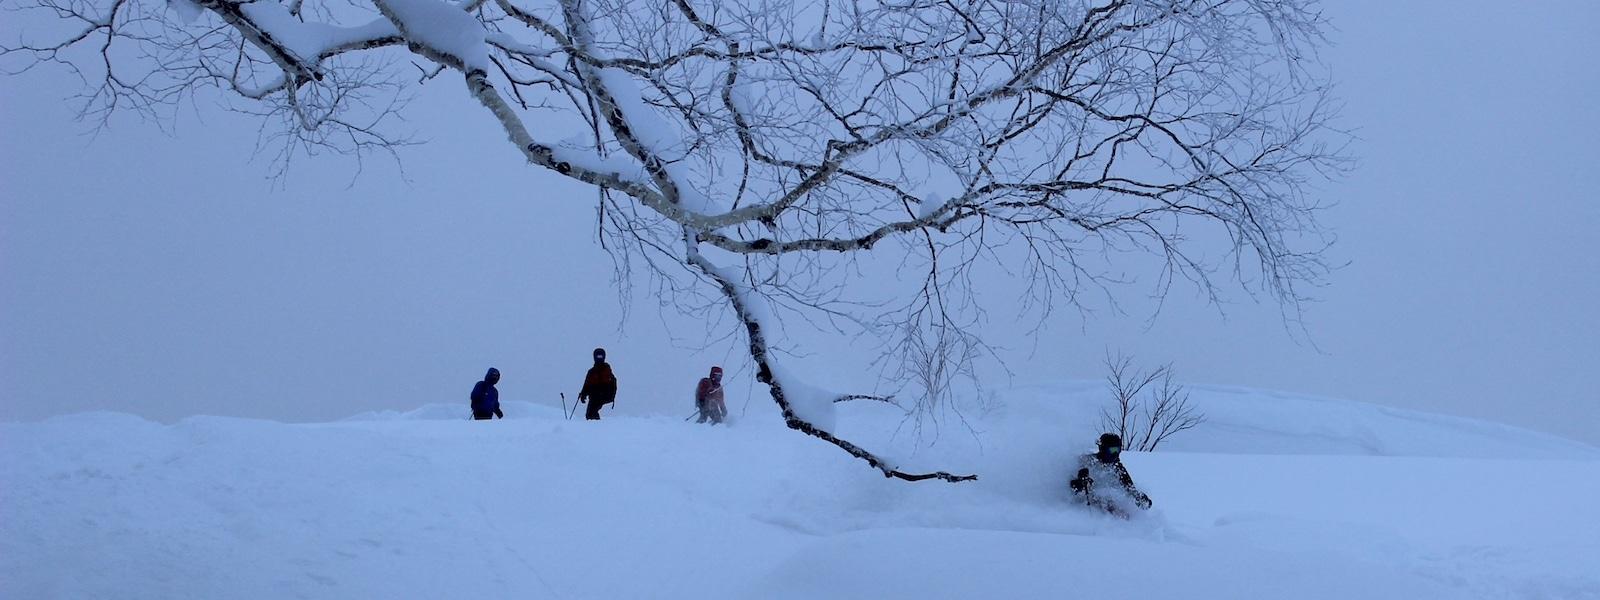 powder skiing in japan